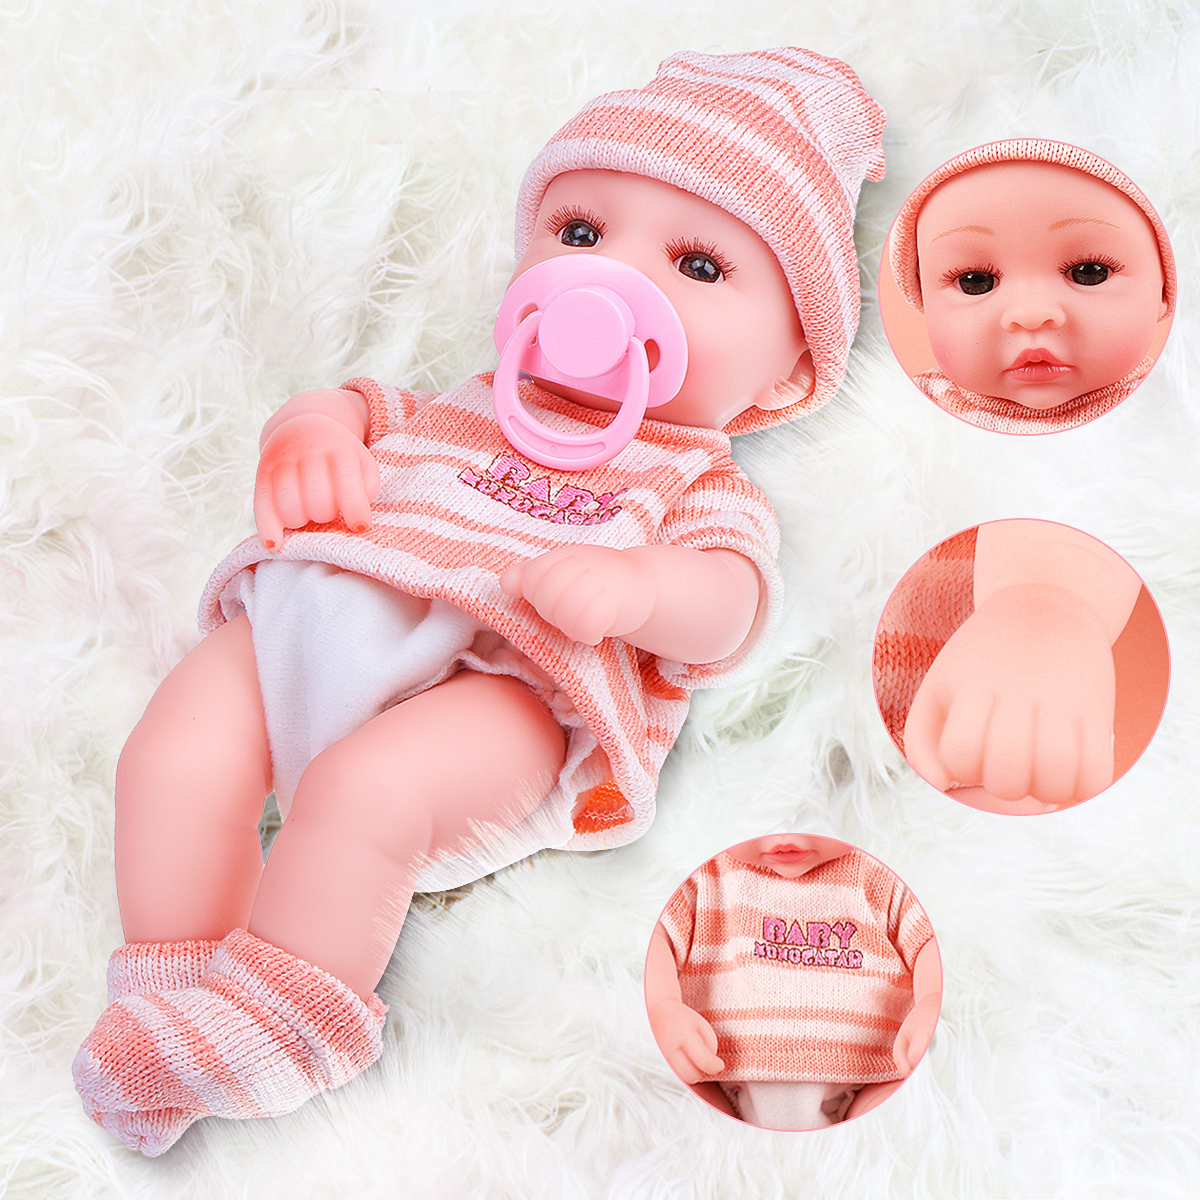 12/'/' Lifelike Newborn Silicon Vinyl Reborn Gift Baby Doll Handmade Realistic Toy